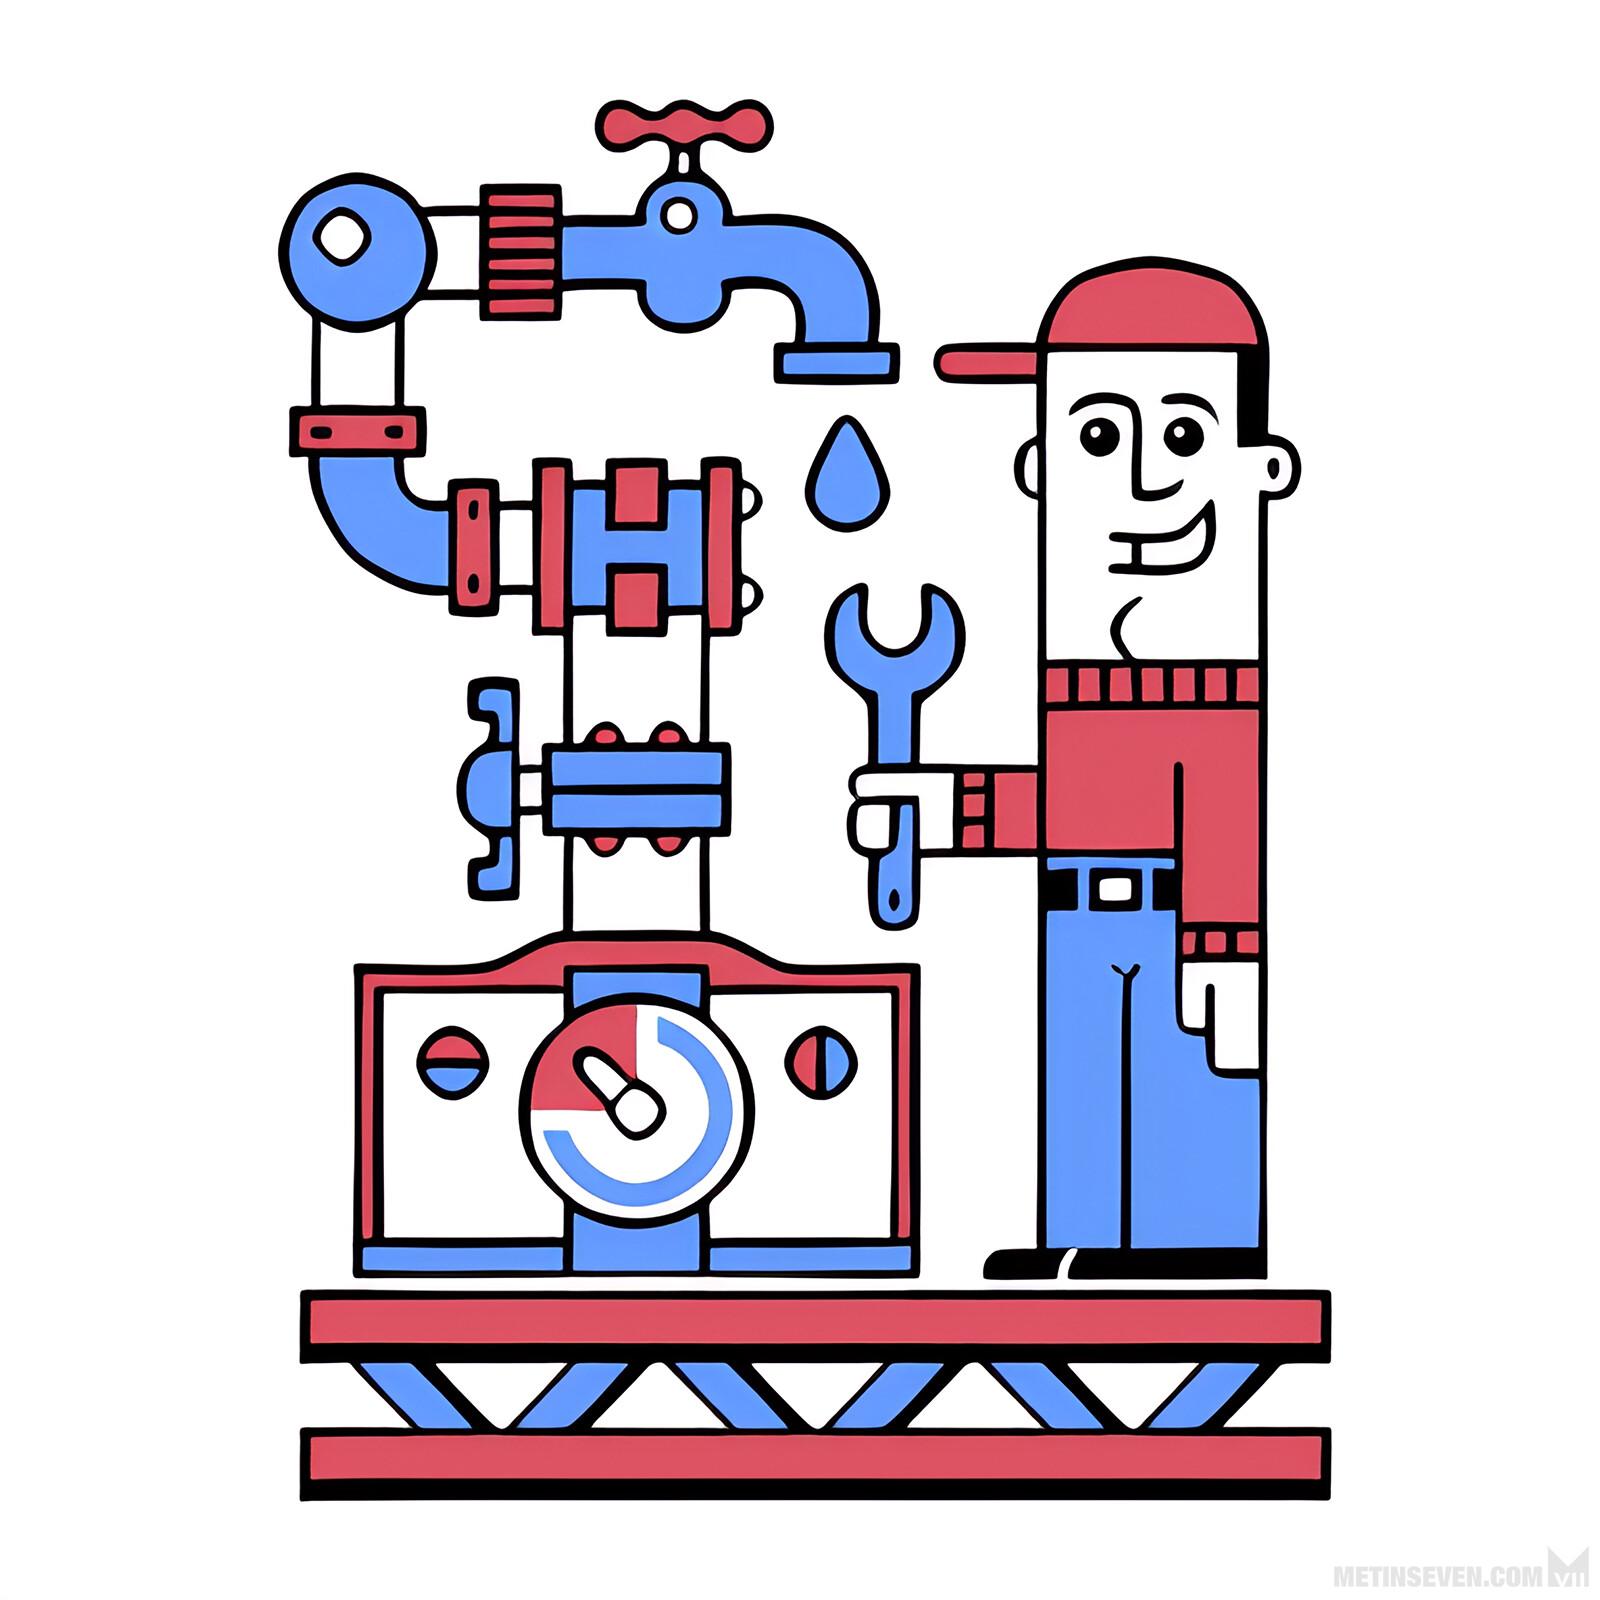 Retro cartoon style logo design for a plumbing company